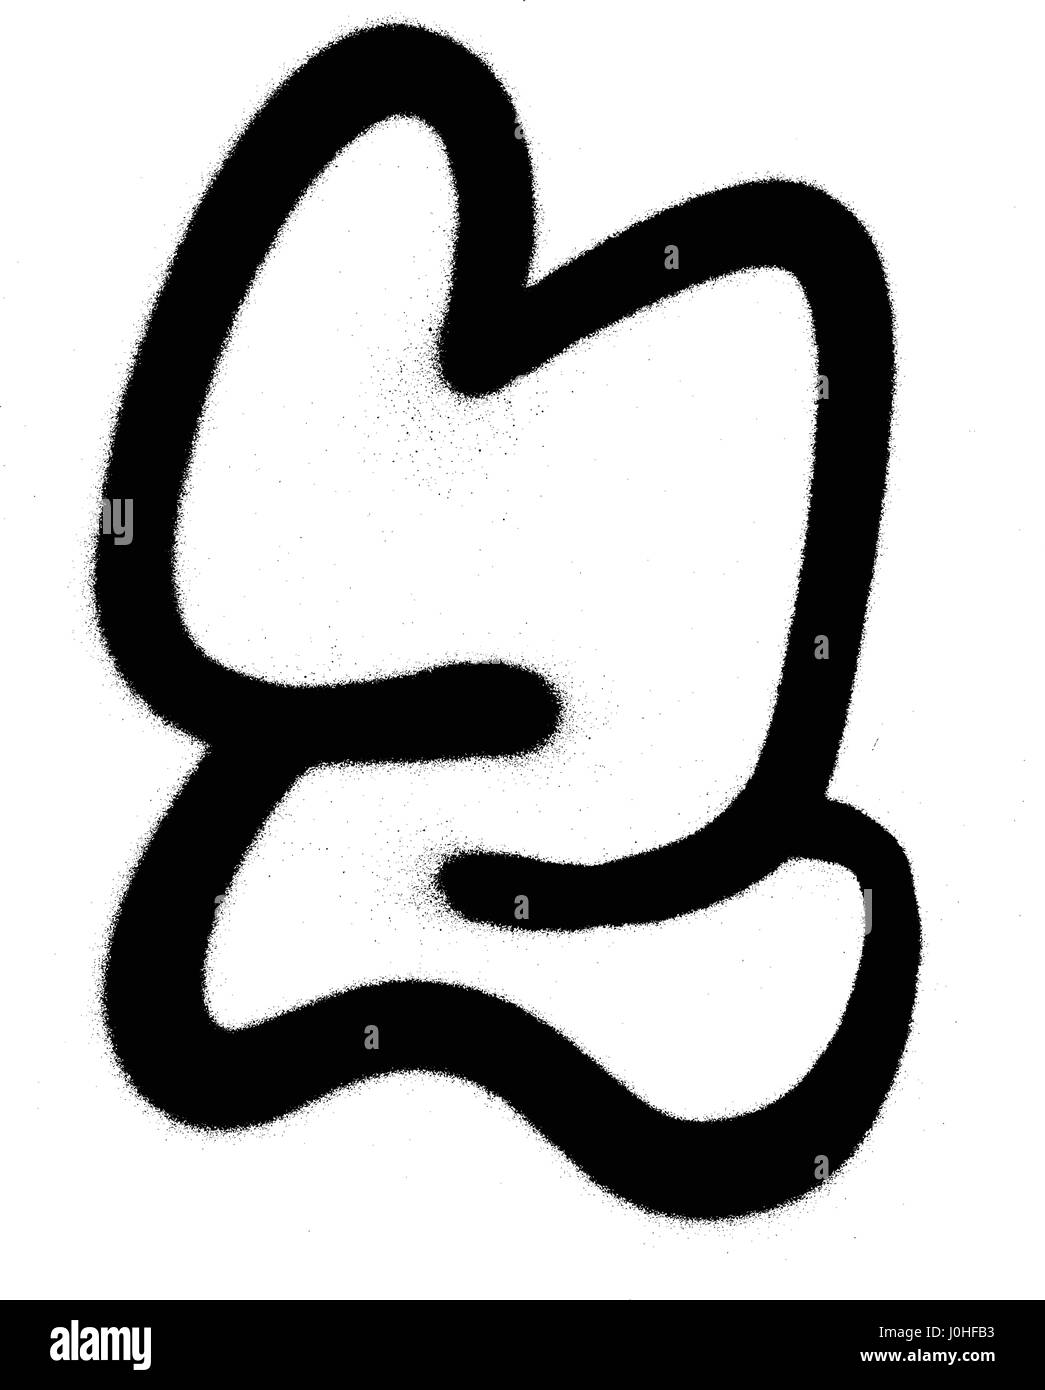 Graffiti bubble font z in black on white